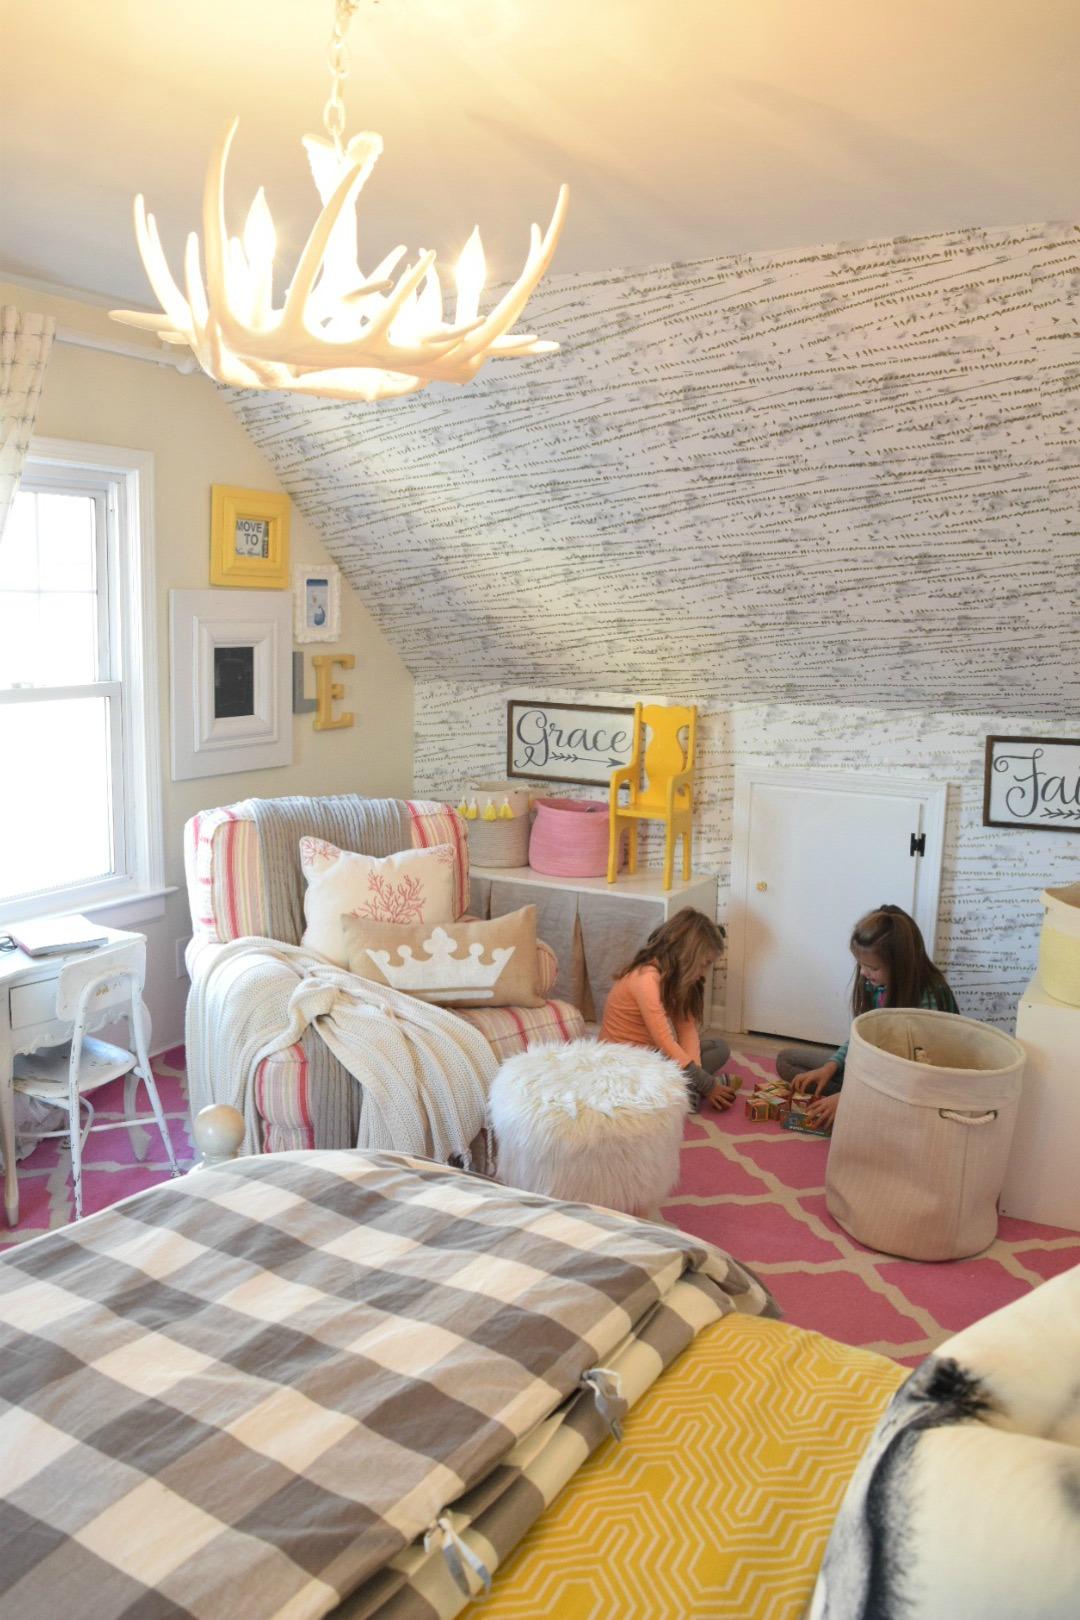 Decor for kids girls bedroom with nesting